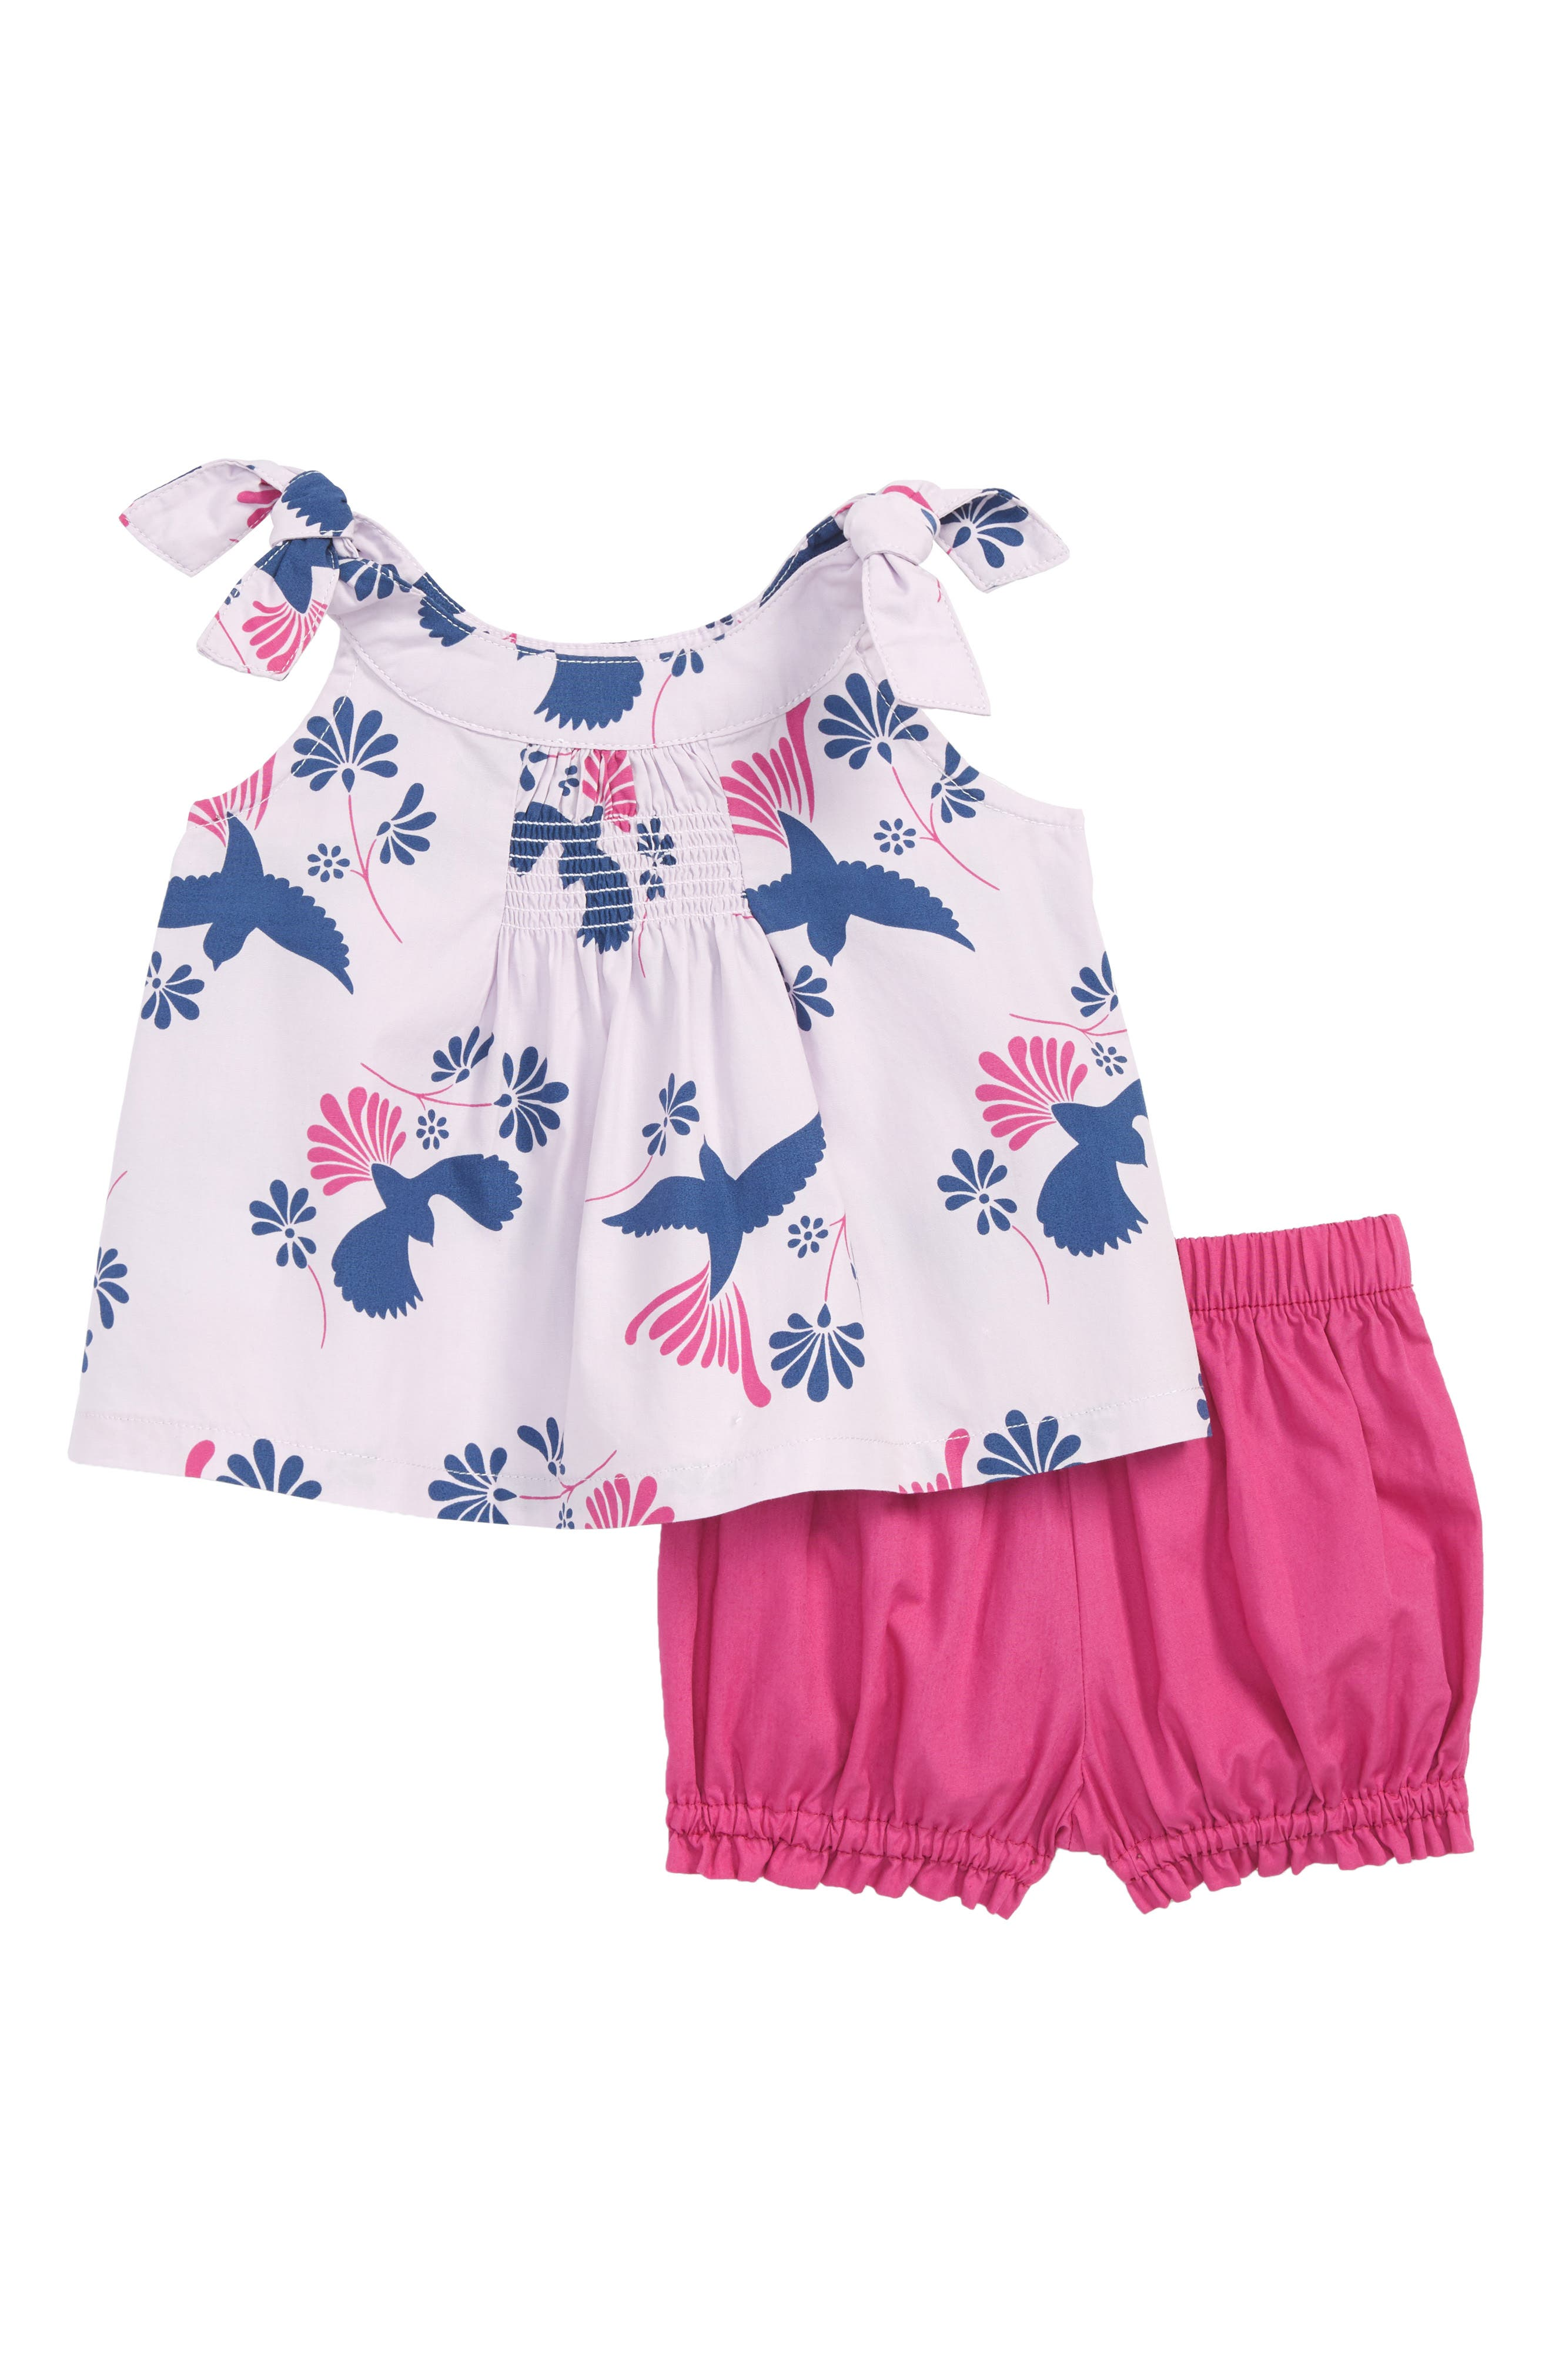 Shoulder Tie Top & Shorts Set,                         Main,                         color, Birds Of A Feather